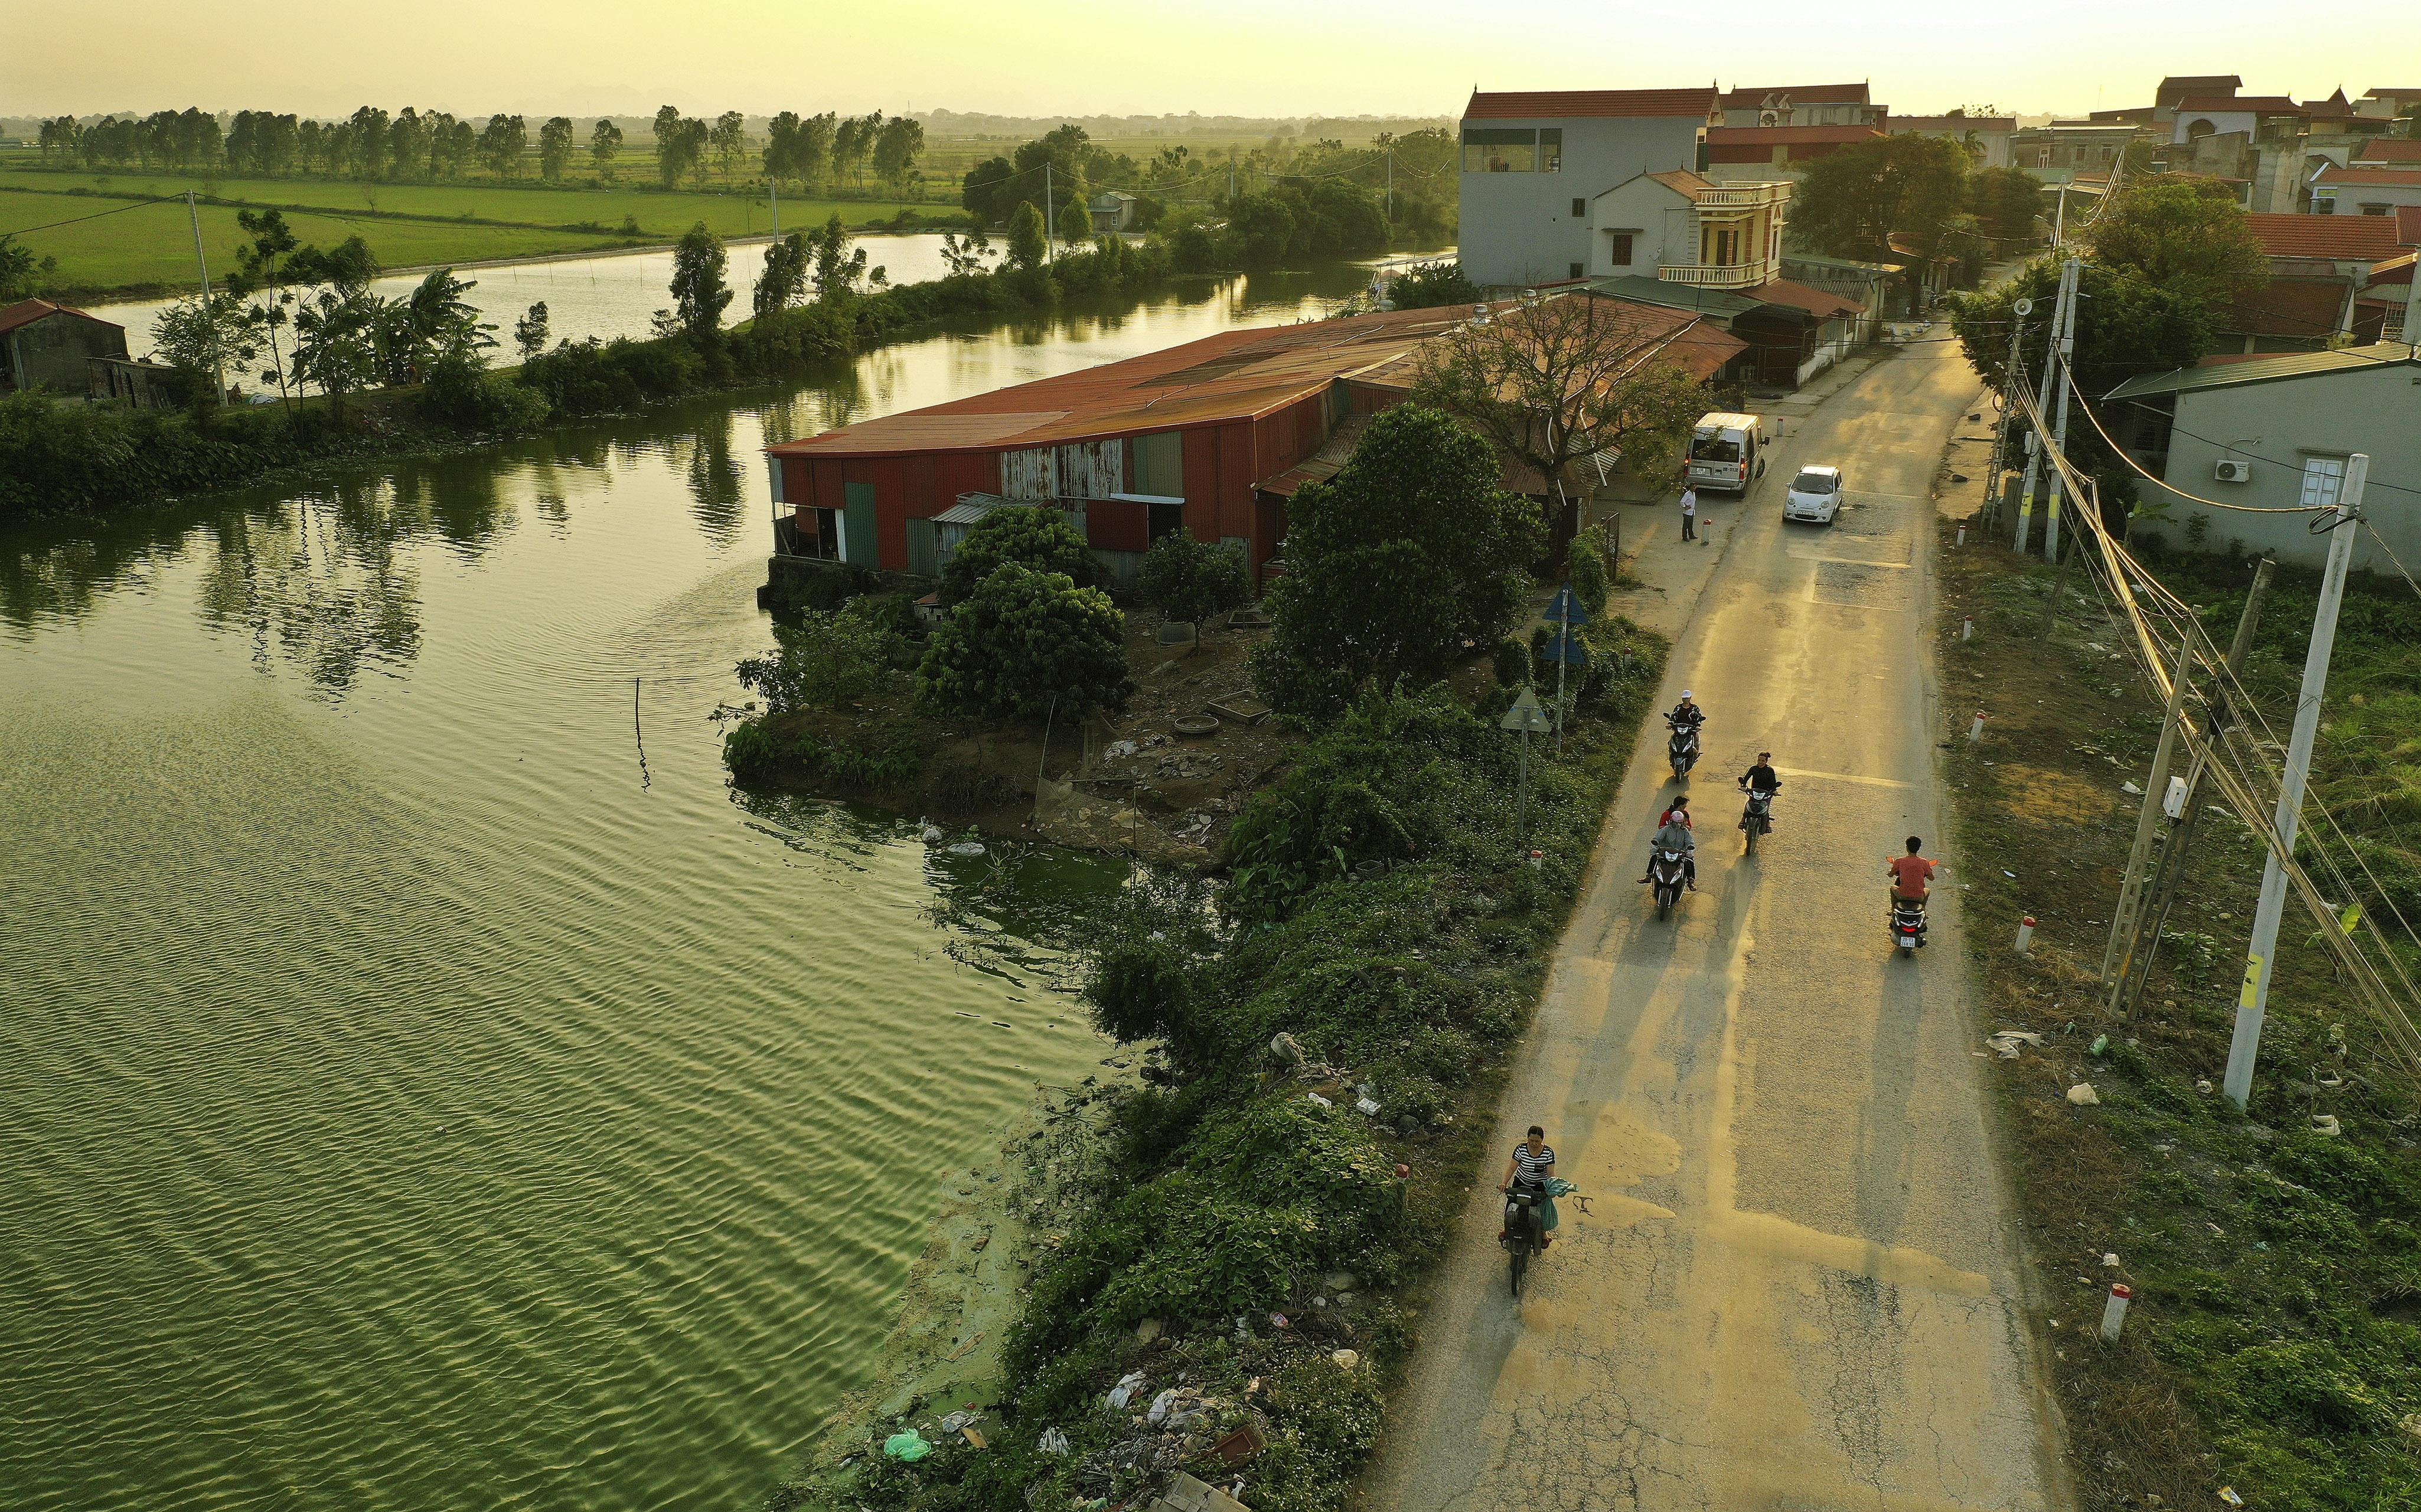 Motorists travel near the water in Hanoi, Vietnam on Saturday, Nov. 16, 2019.